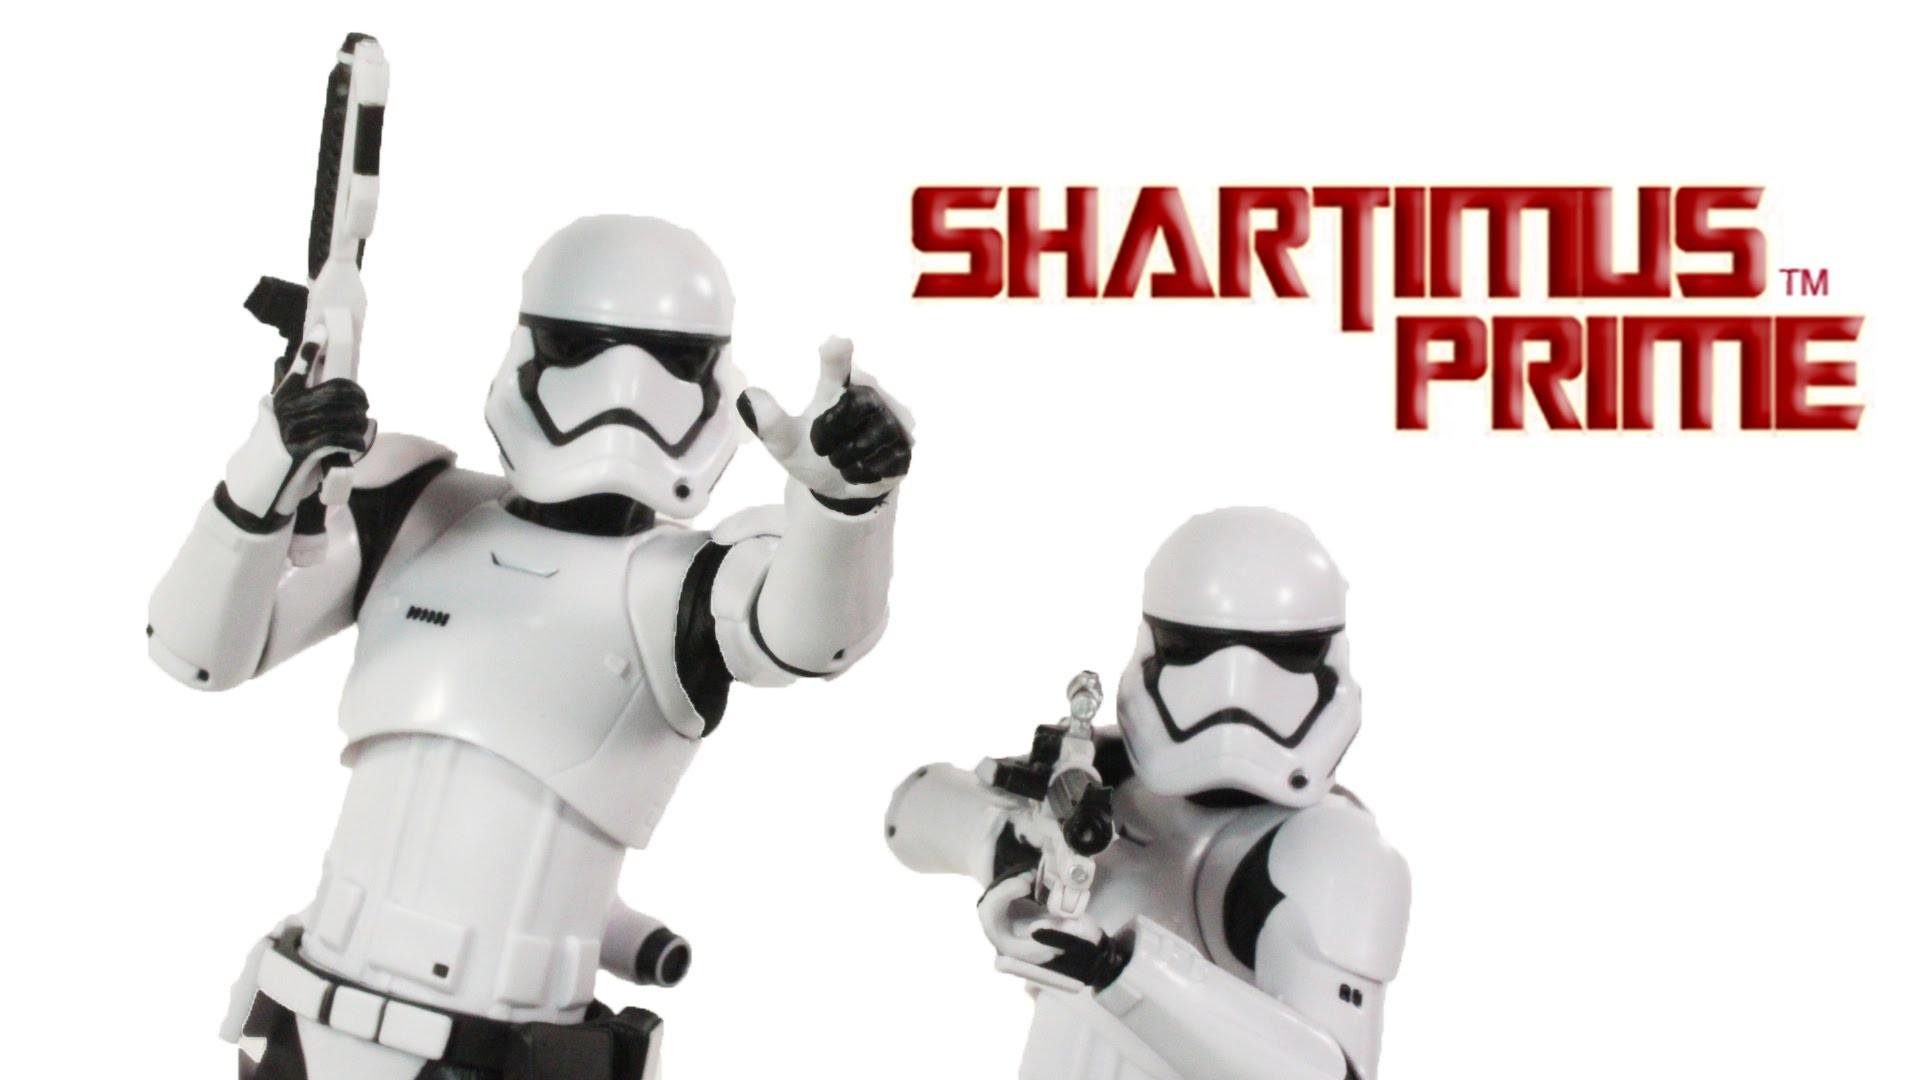 Kotobukiya First Order Stormtroopers Star Wars The Force Awakens Episode  VII Movie Statue Figure Rev